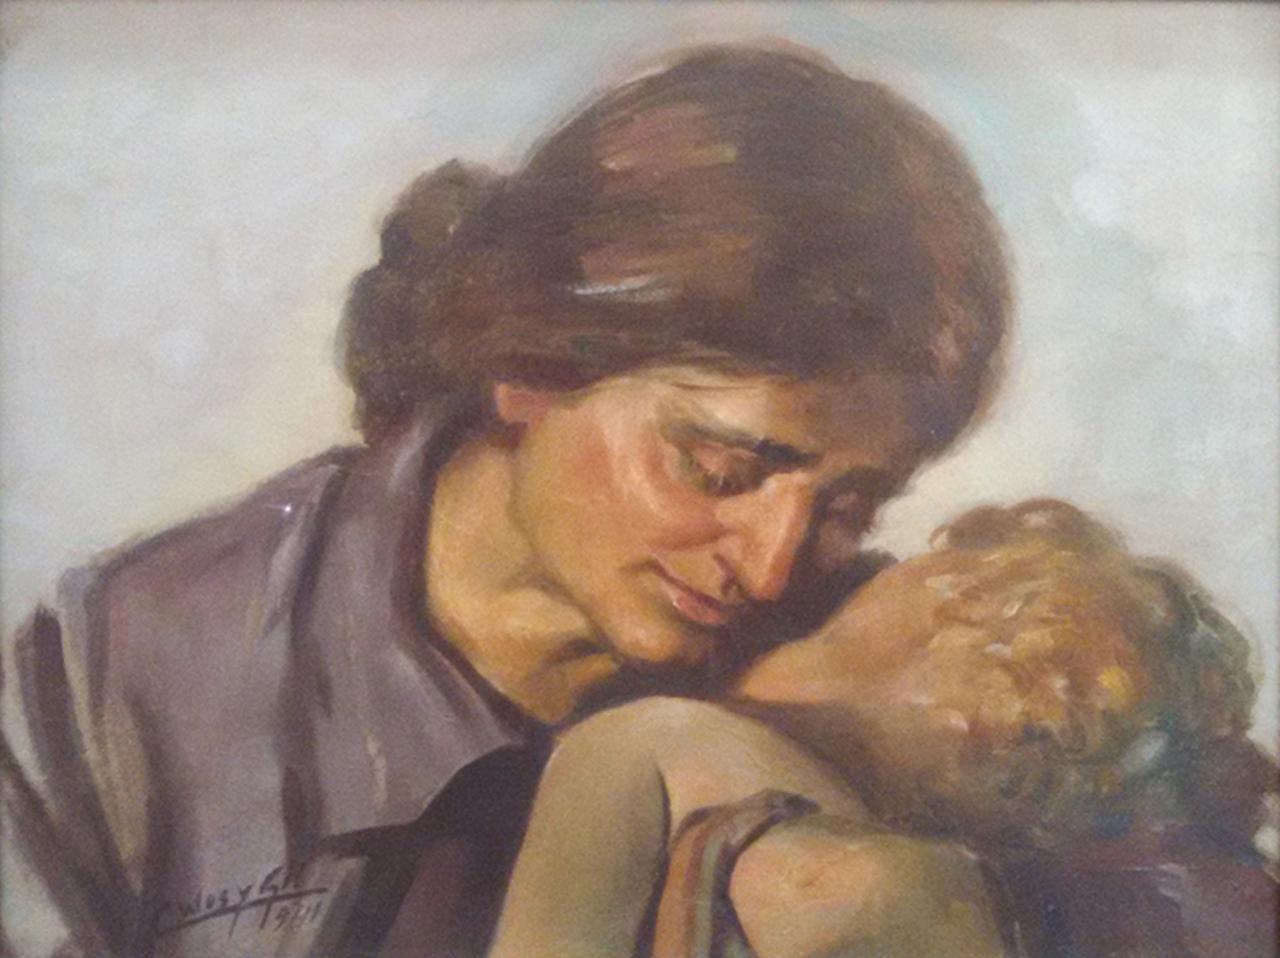 La madre, Celeste WOss y Gil, 1941